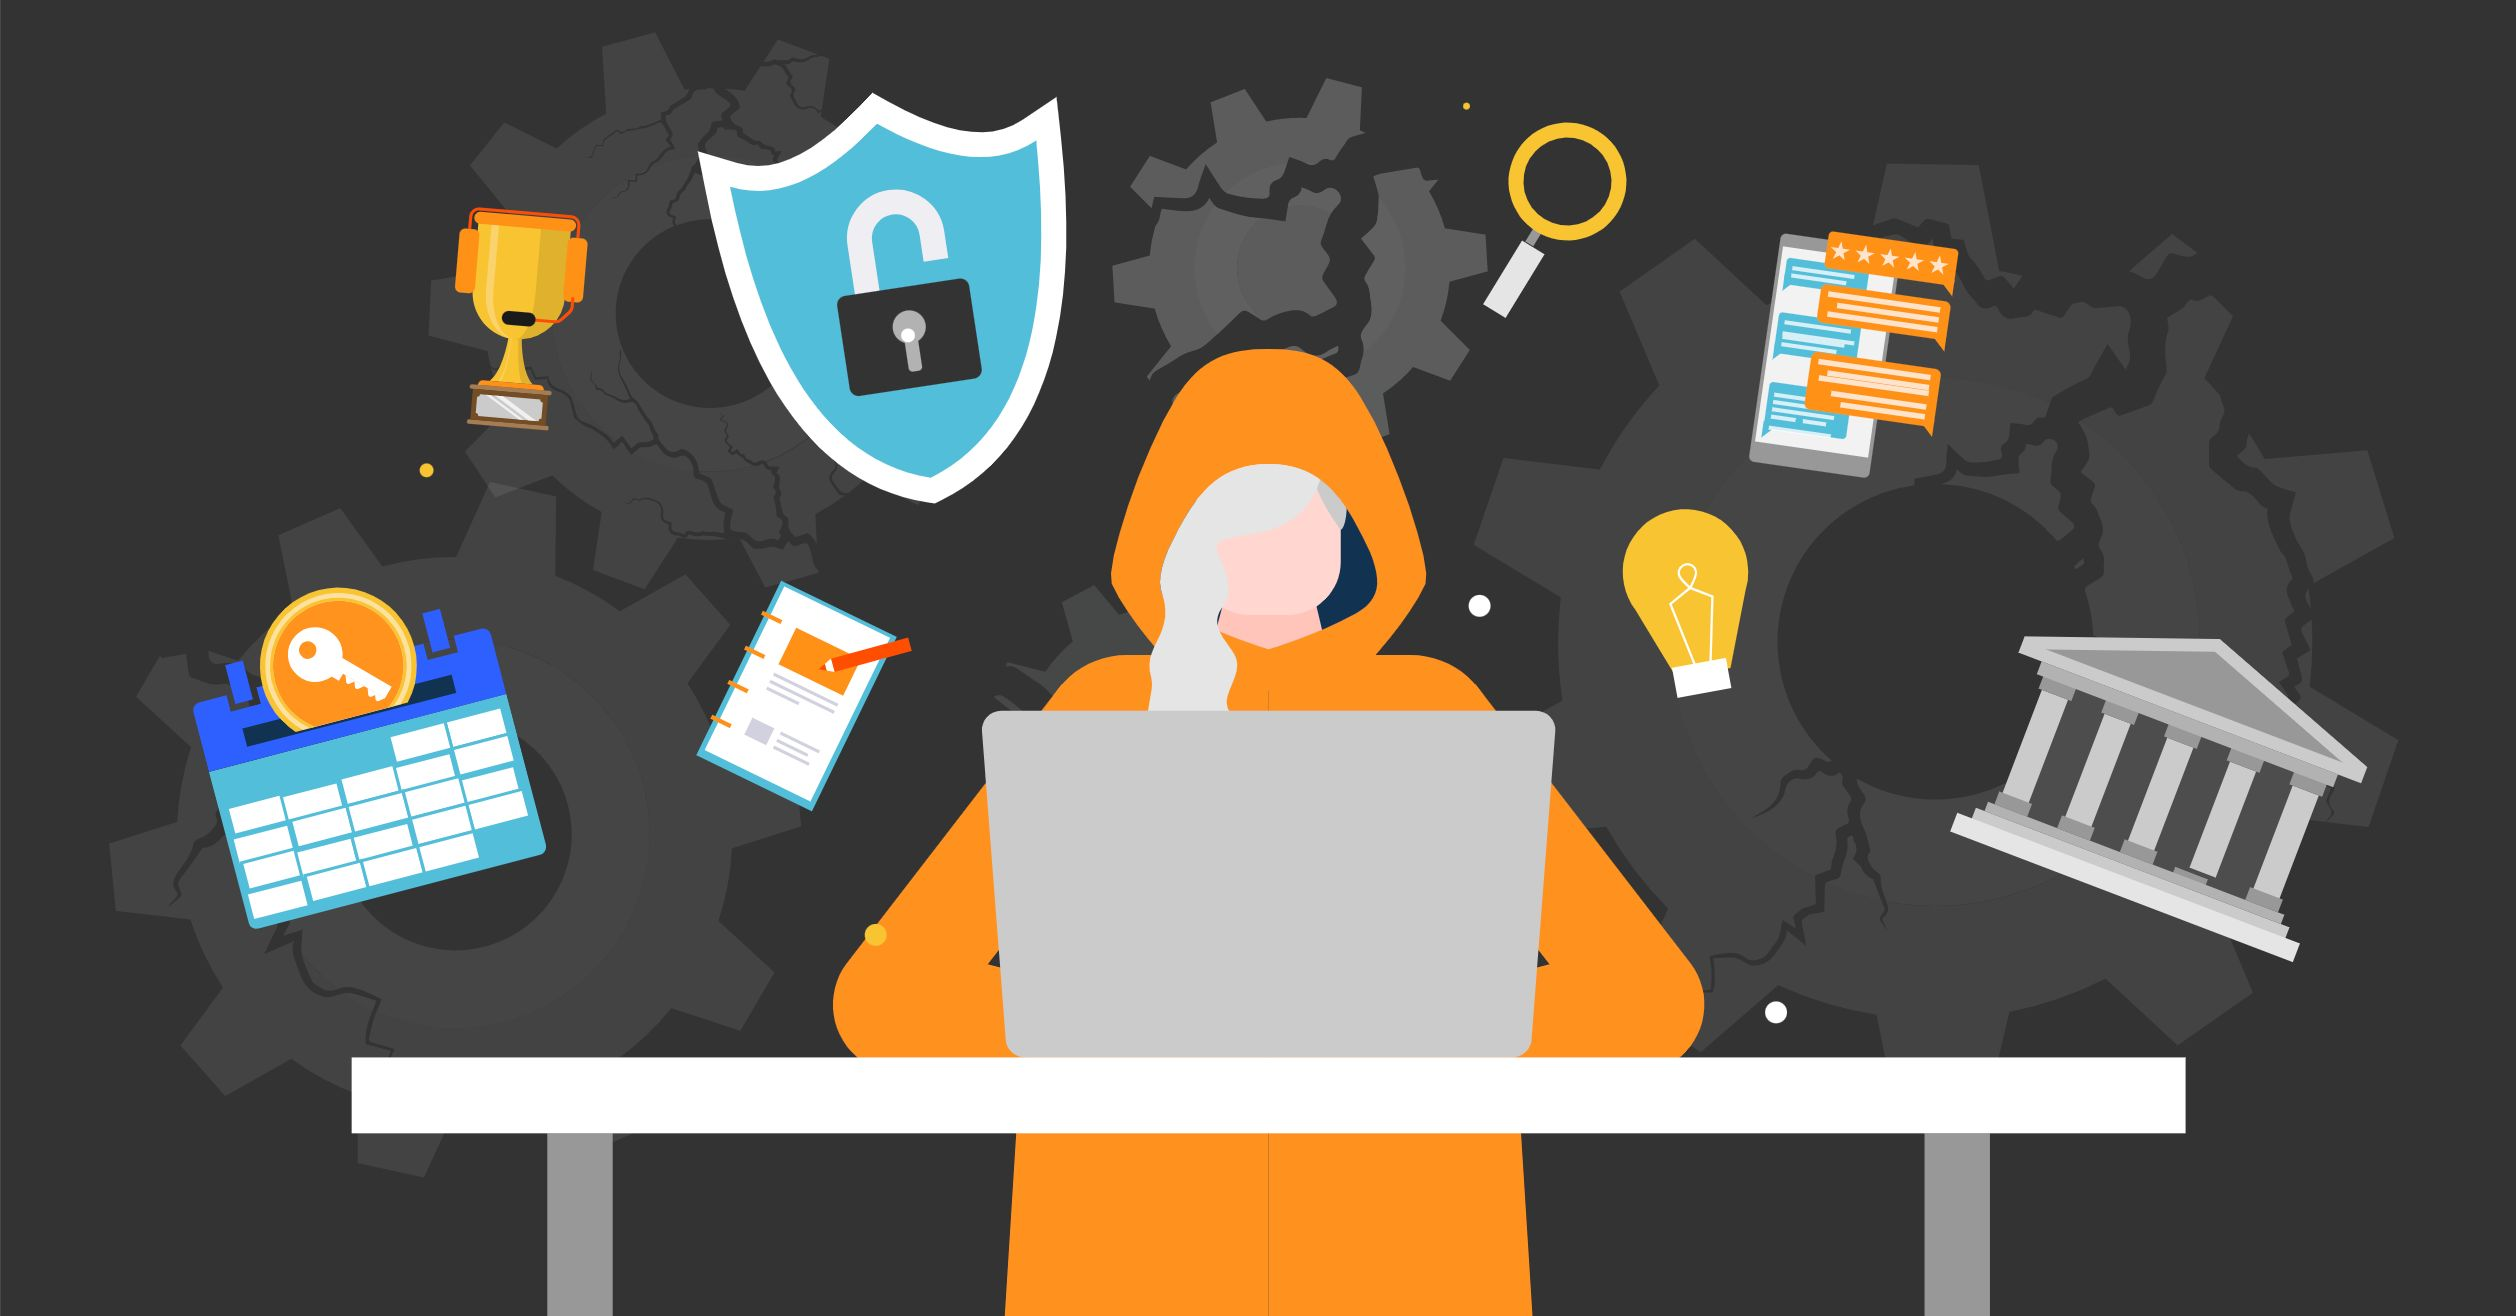 /9-vital-api-security-threats-every-team-should-watch-for-jp3e3u18 feature image